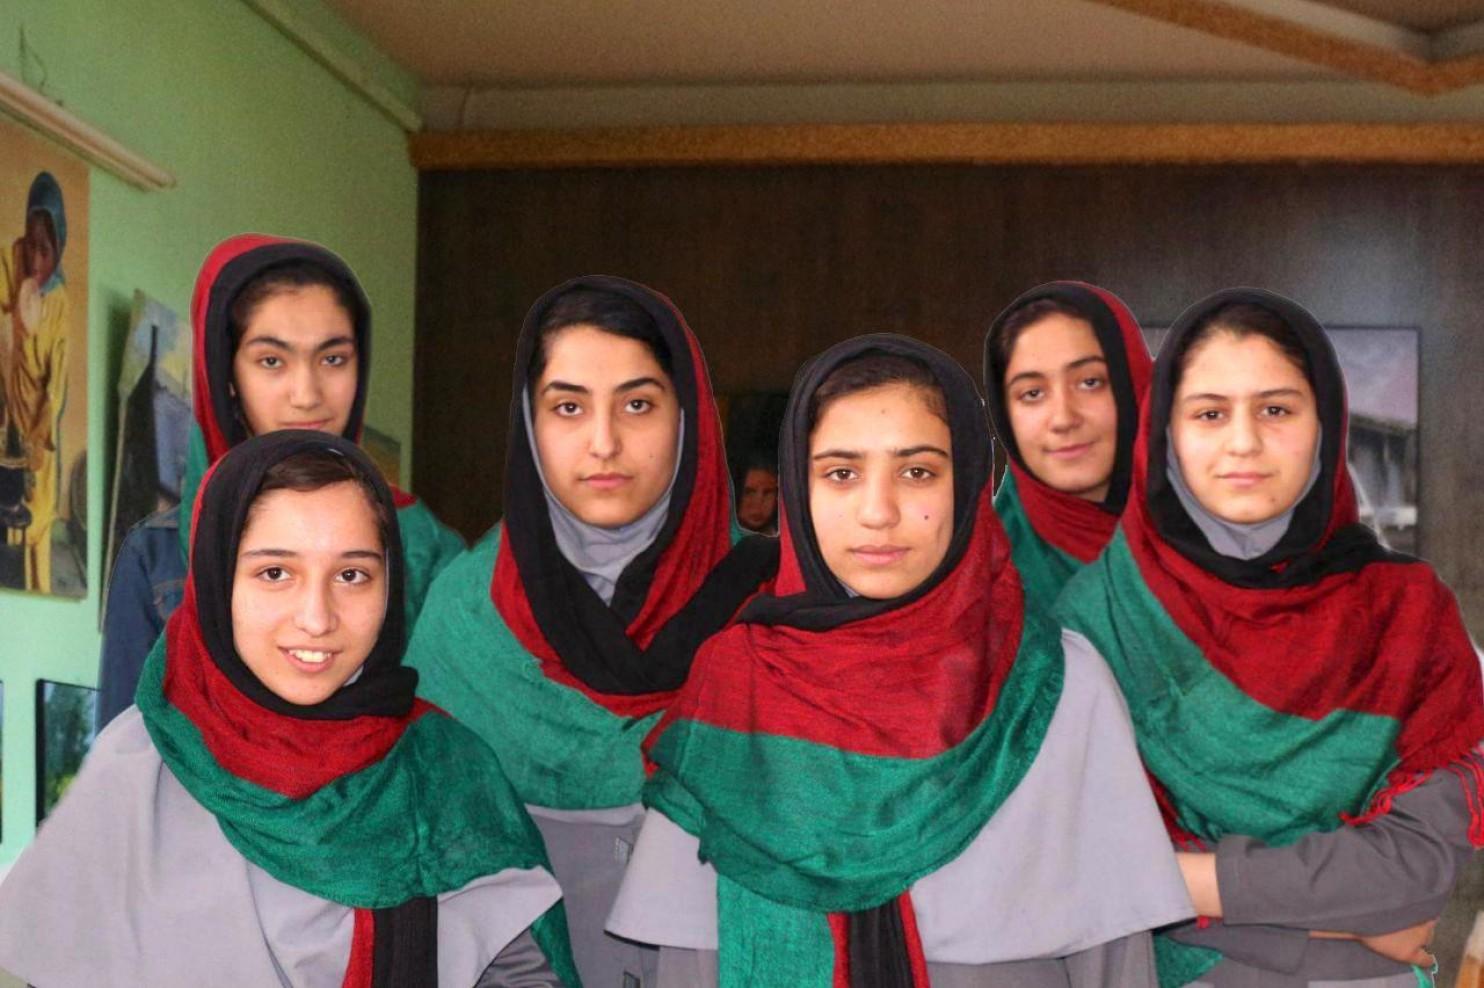 Visas Approved for Afghan All Girls Robotics Team